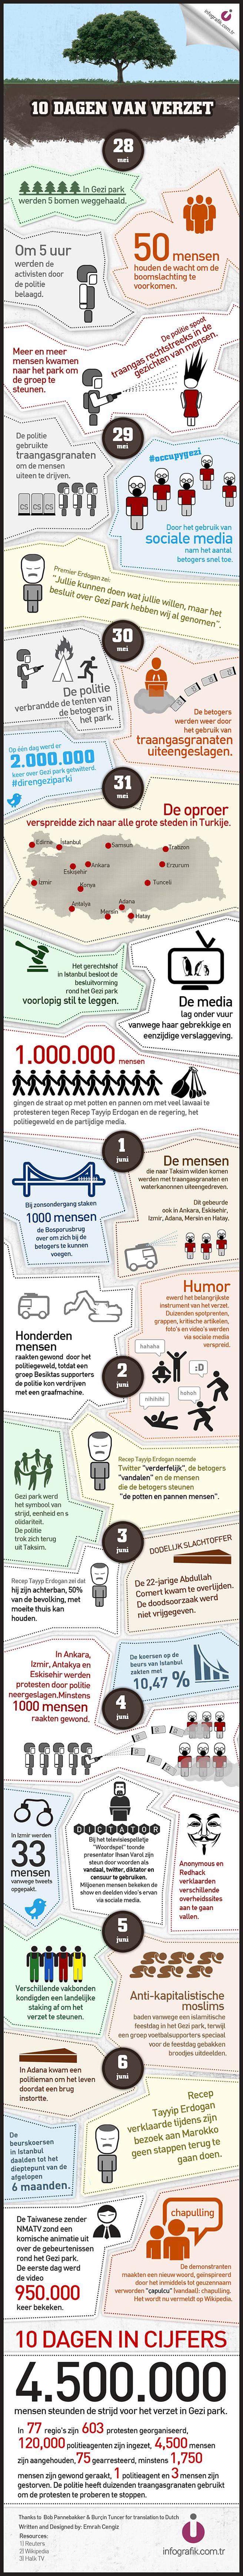 Gezi Parki infografik Ducth